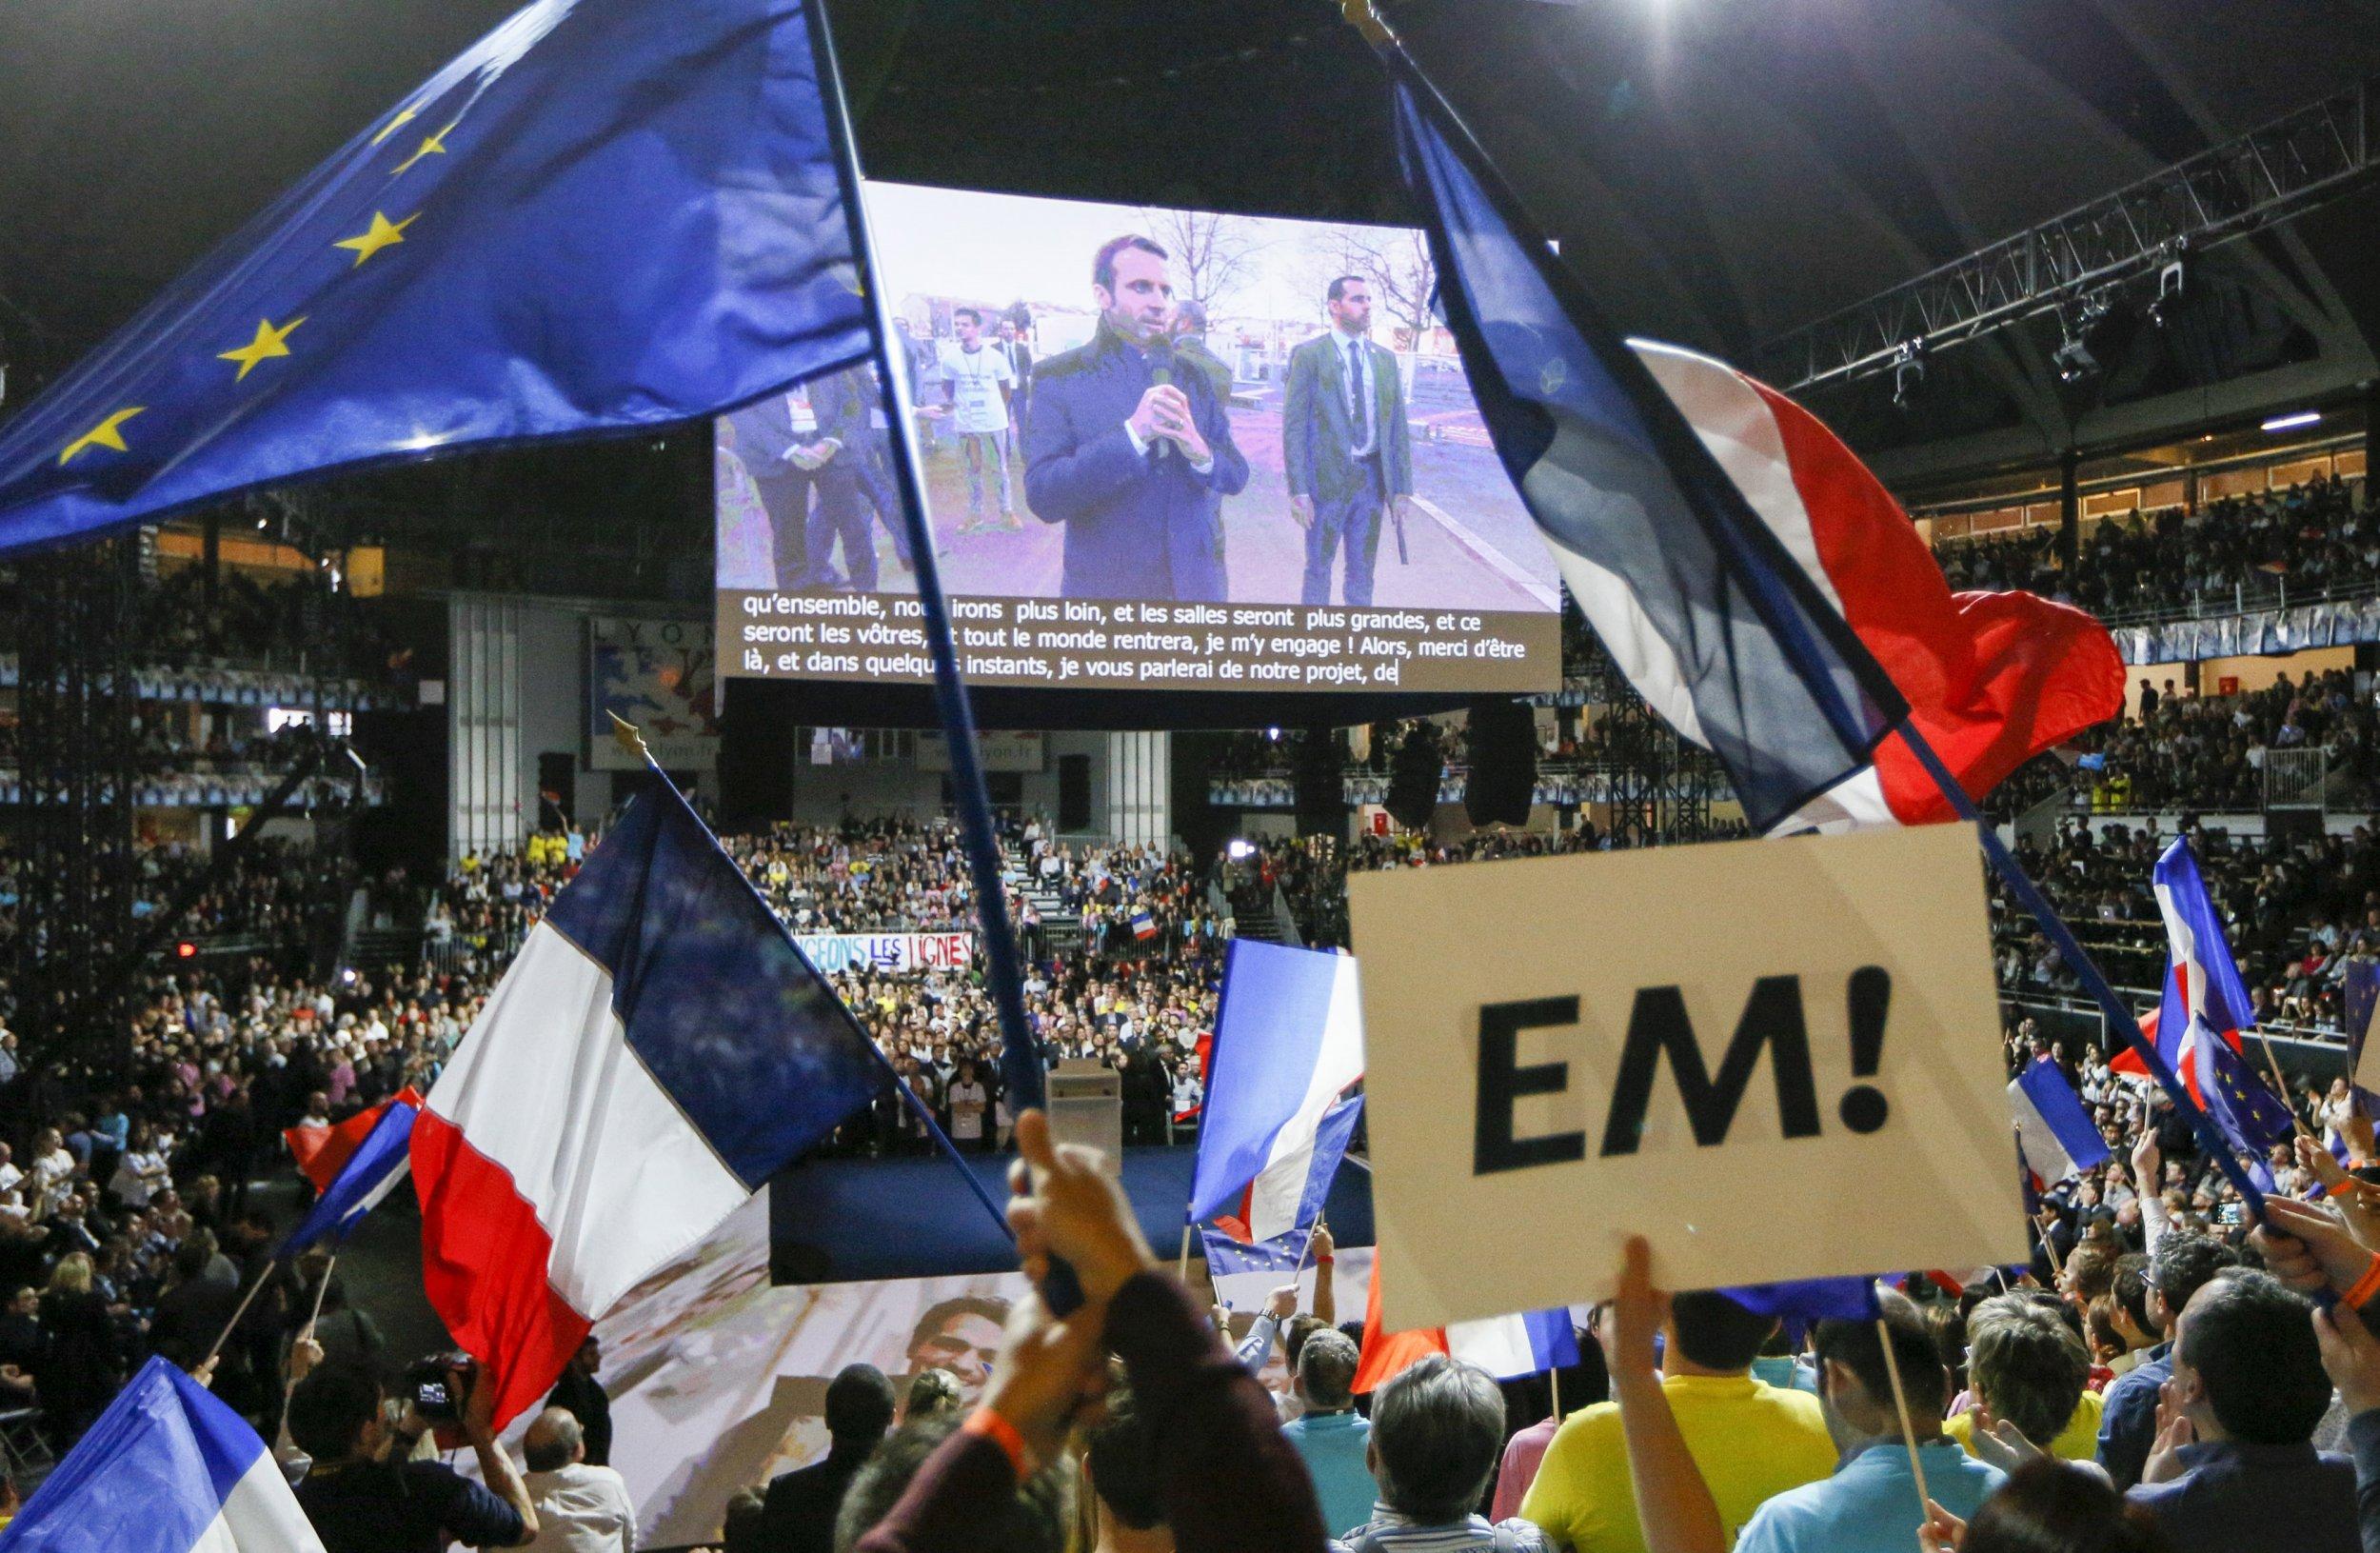 Emmanuel Macron rally 2017